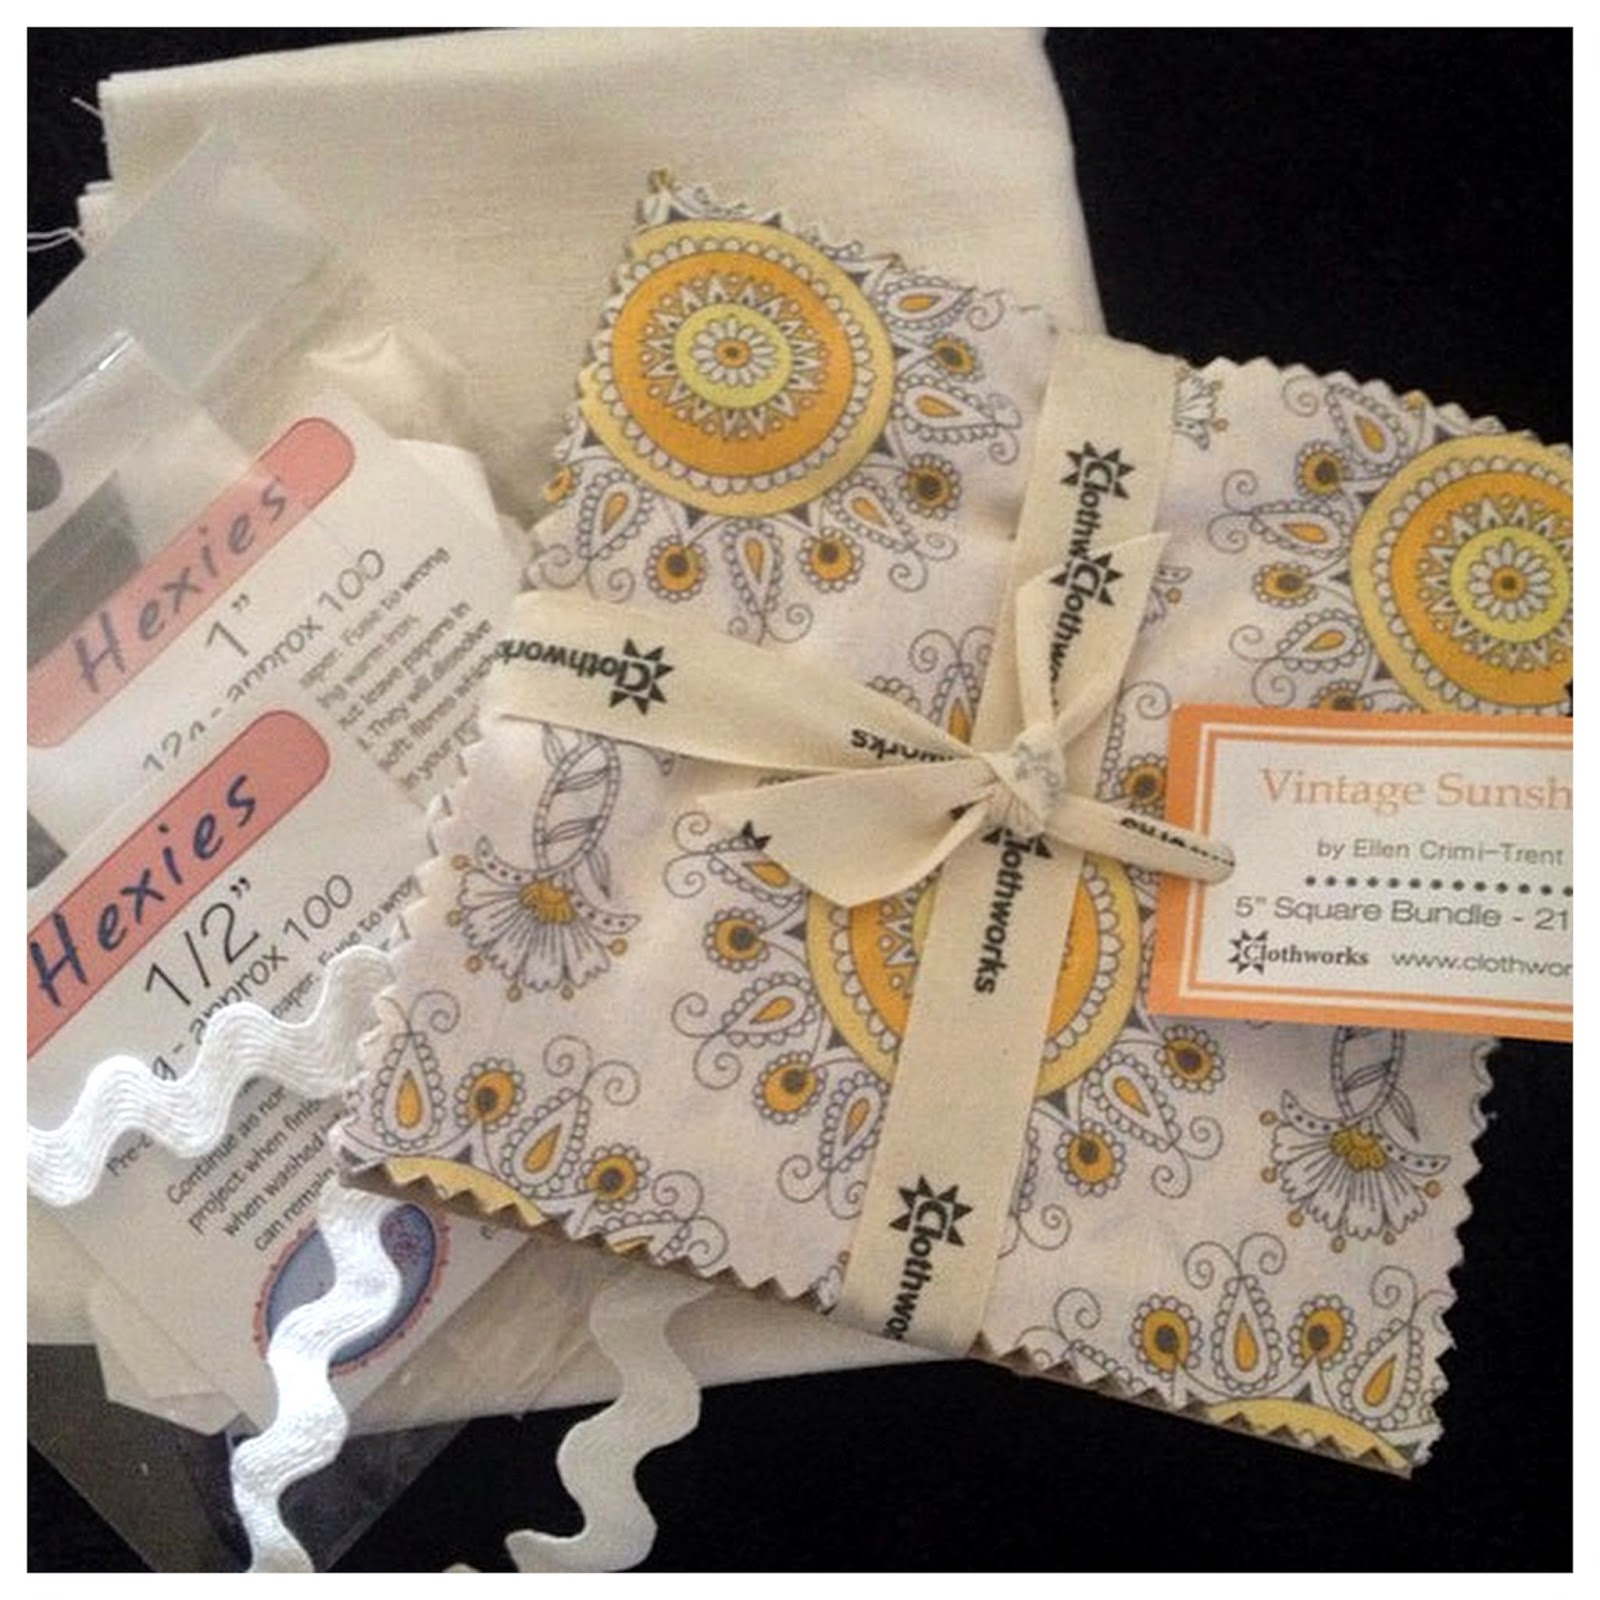 FitzBirch Crafts: Hexagon Patchwork Pin Cushion : sew bright alpine quilting - Adamdwight.com